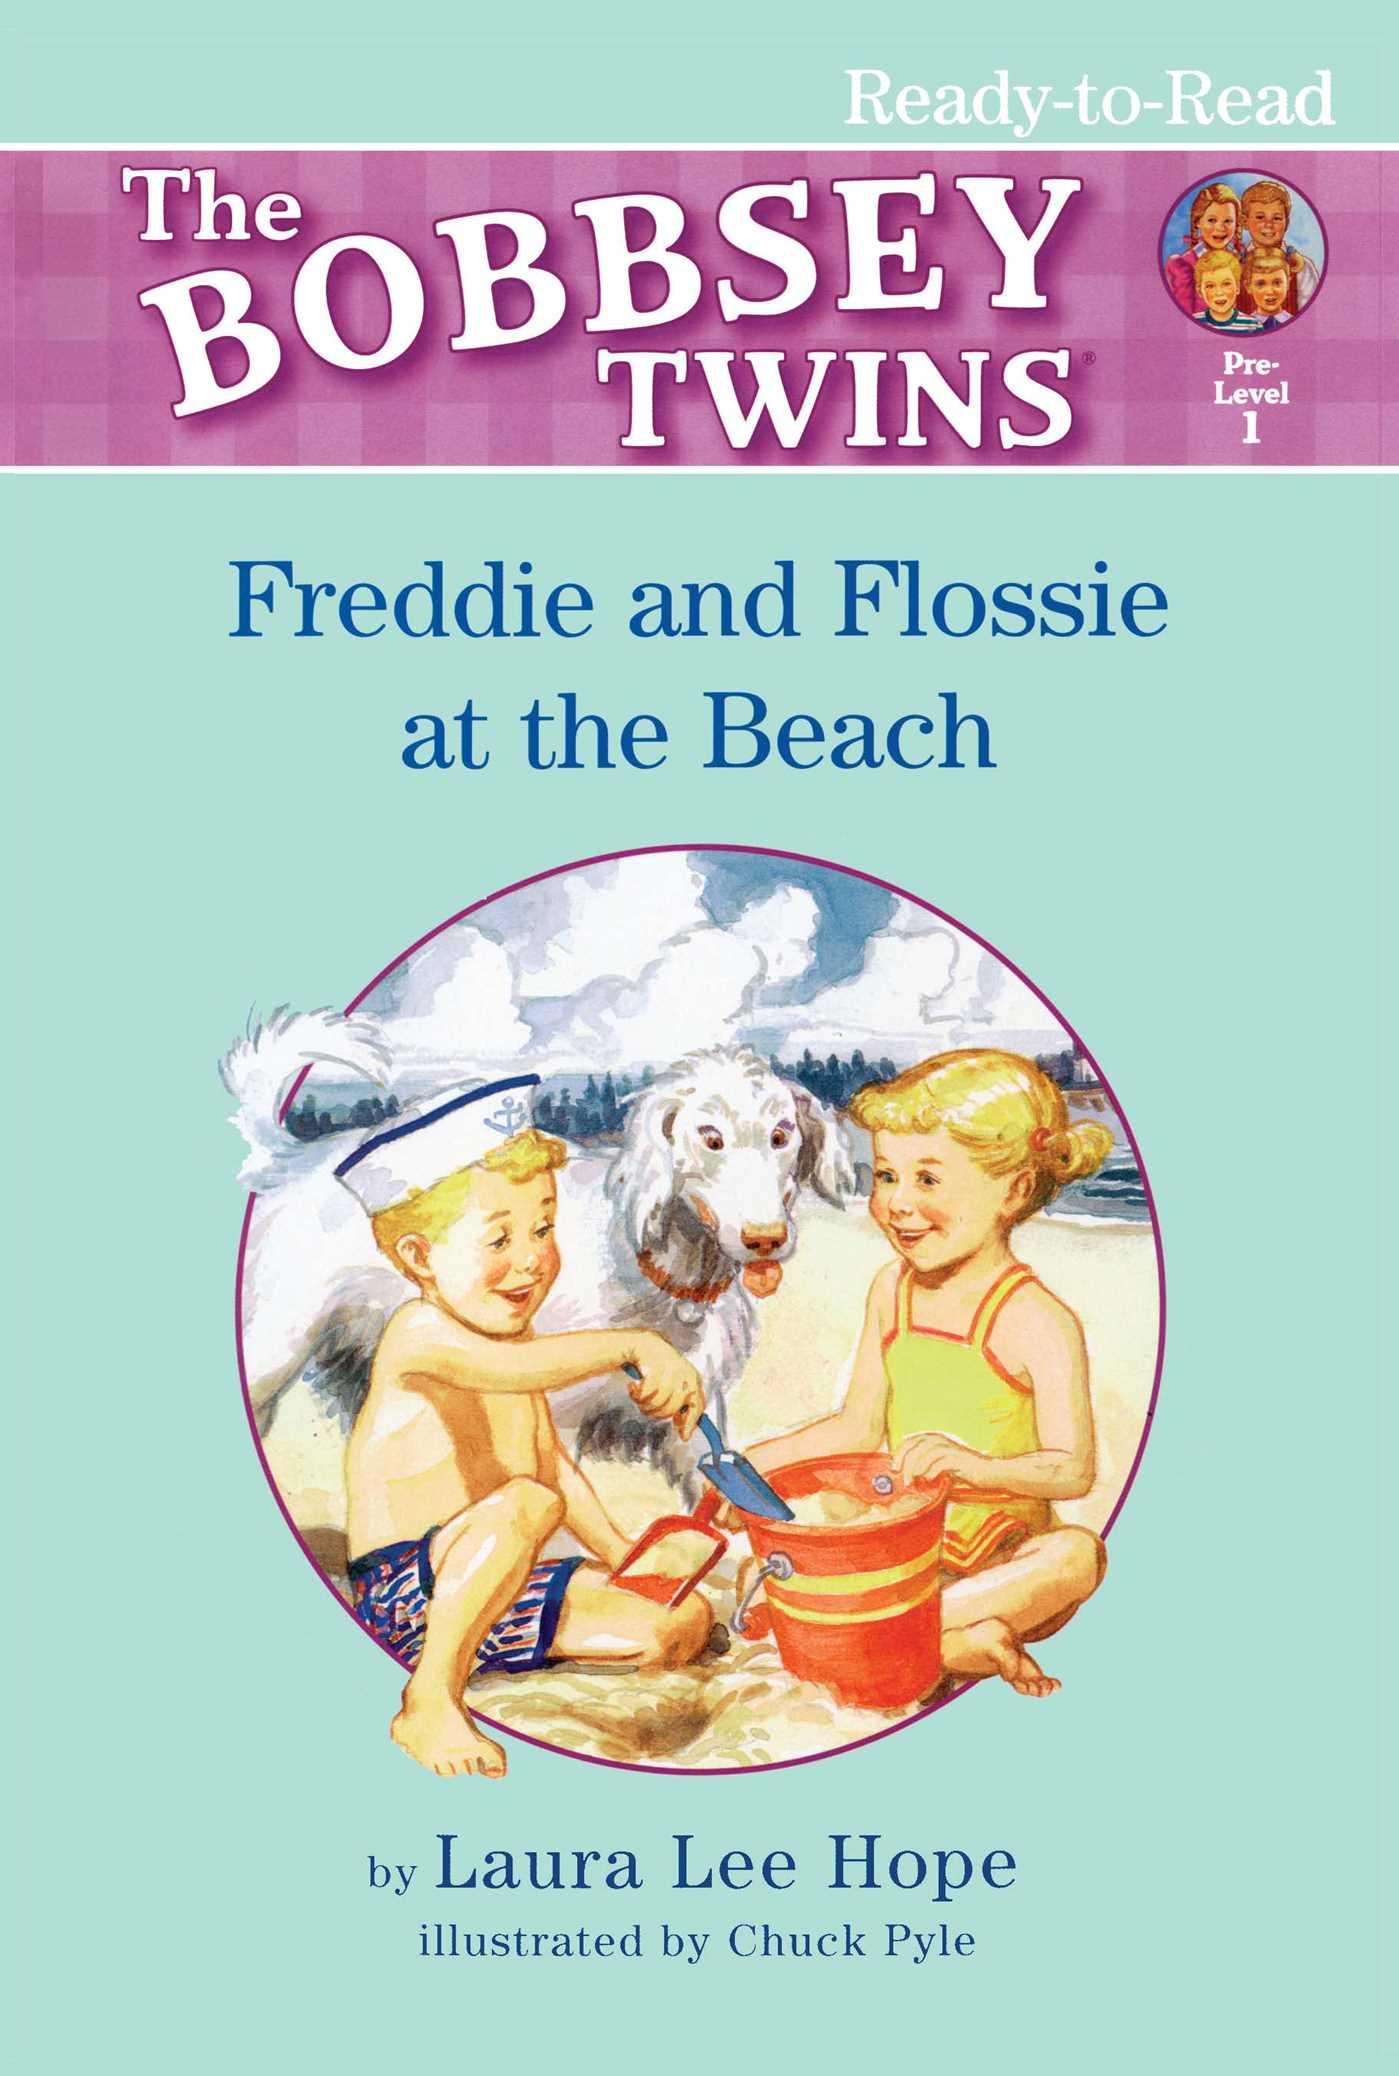 Freddie and flossie at the beach 9781416902683 hr